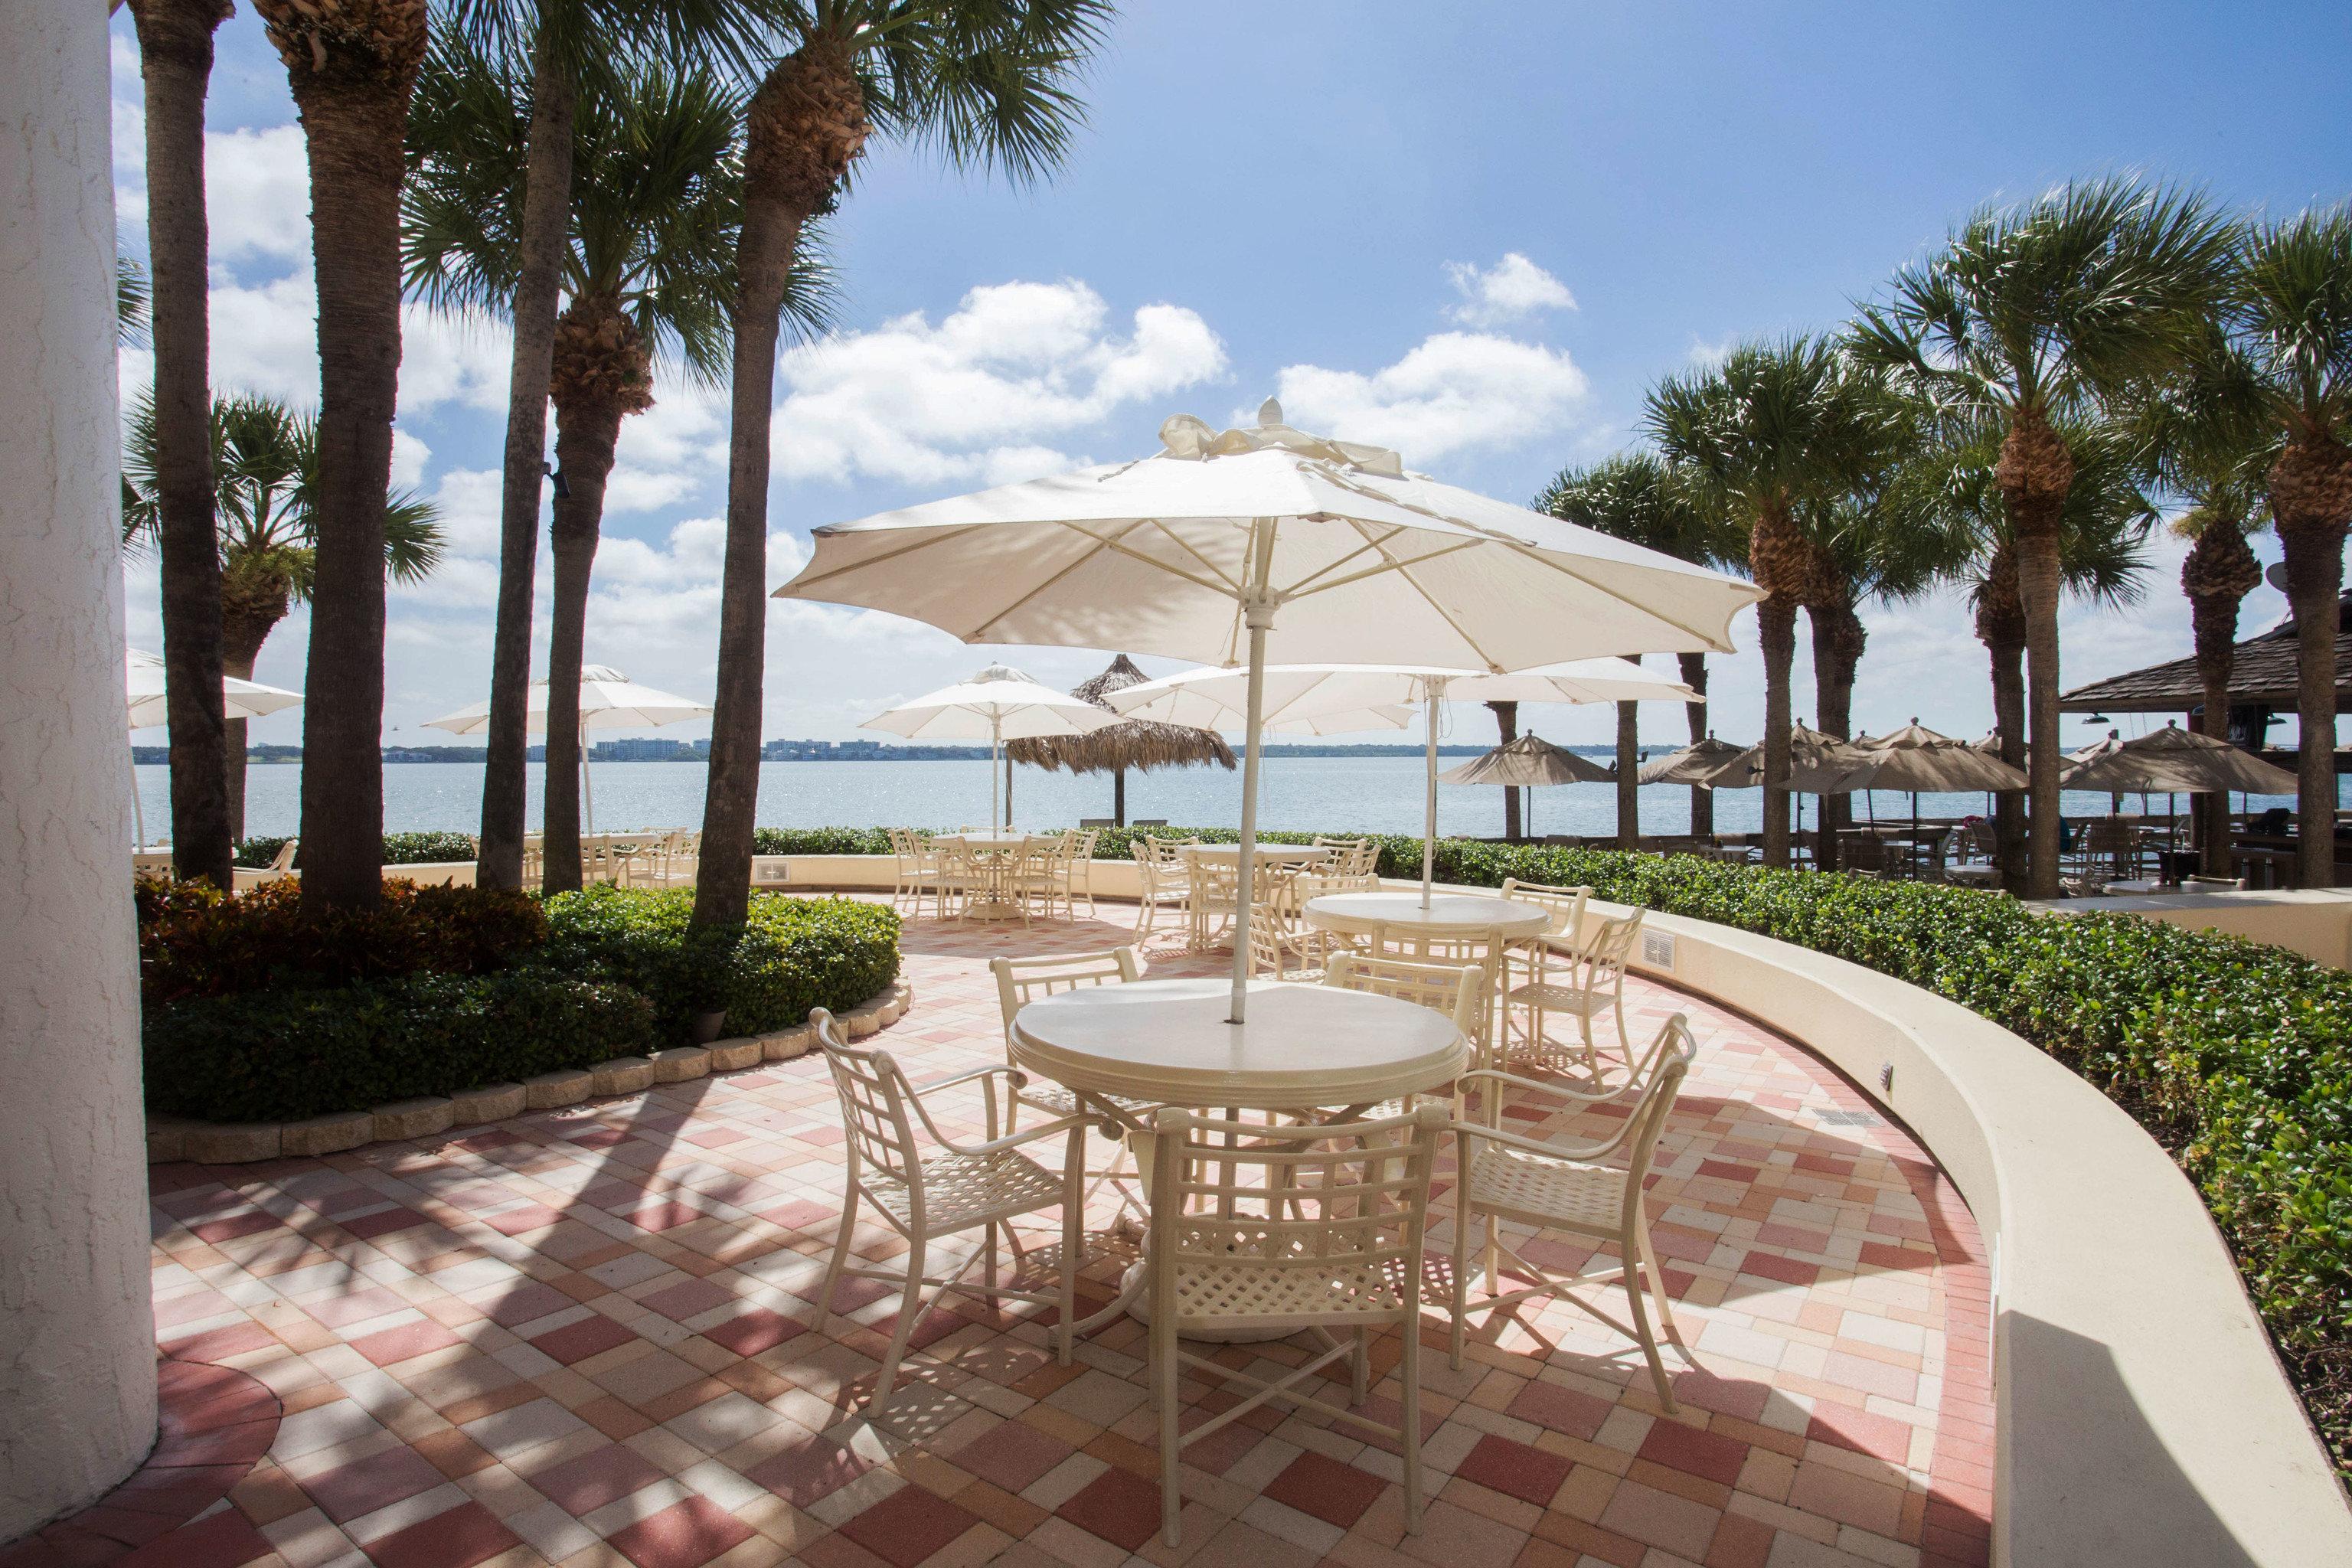 sky tree property leisure Resort Villa hacienda swimming pool restaurant